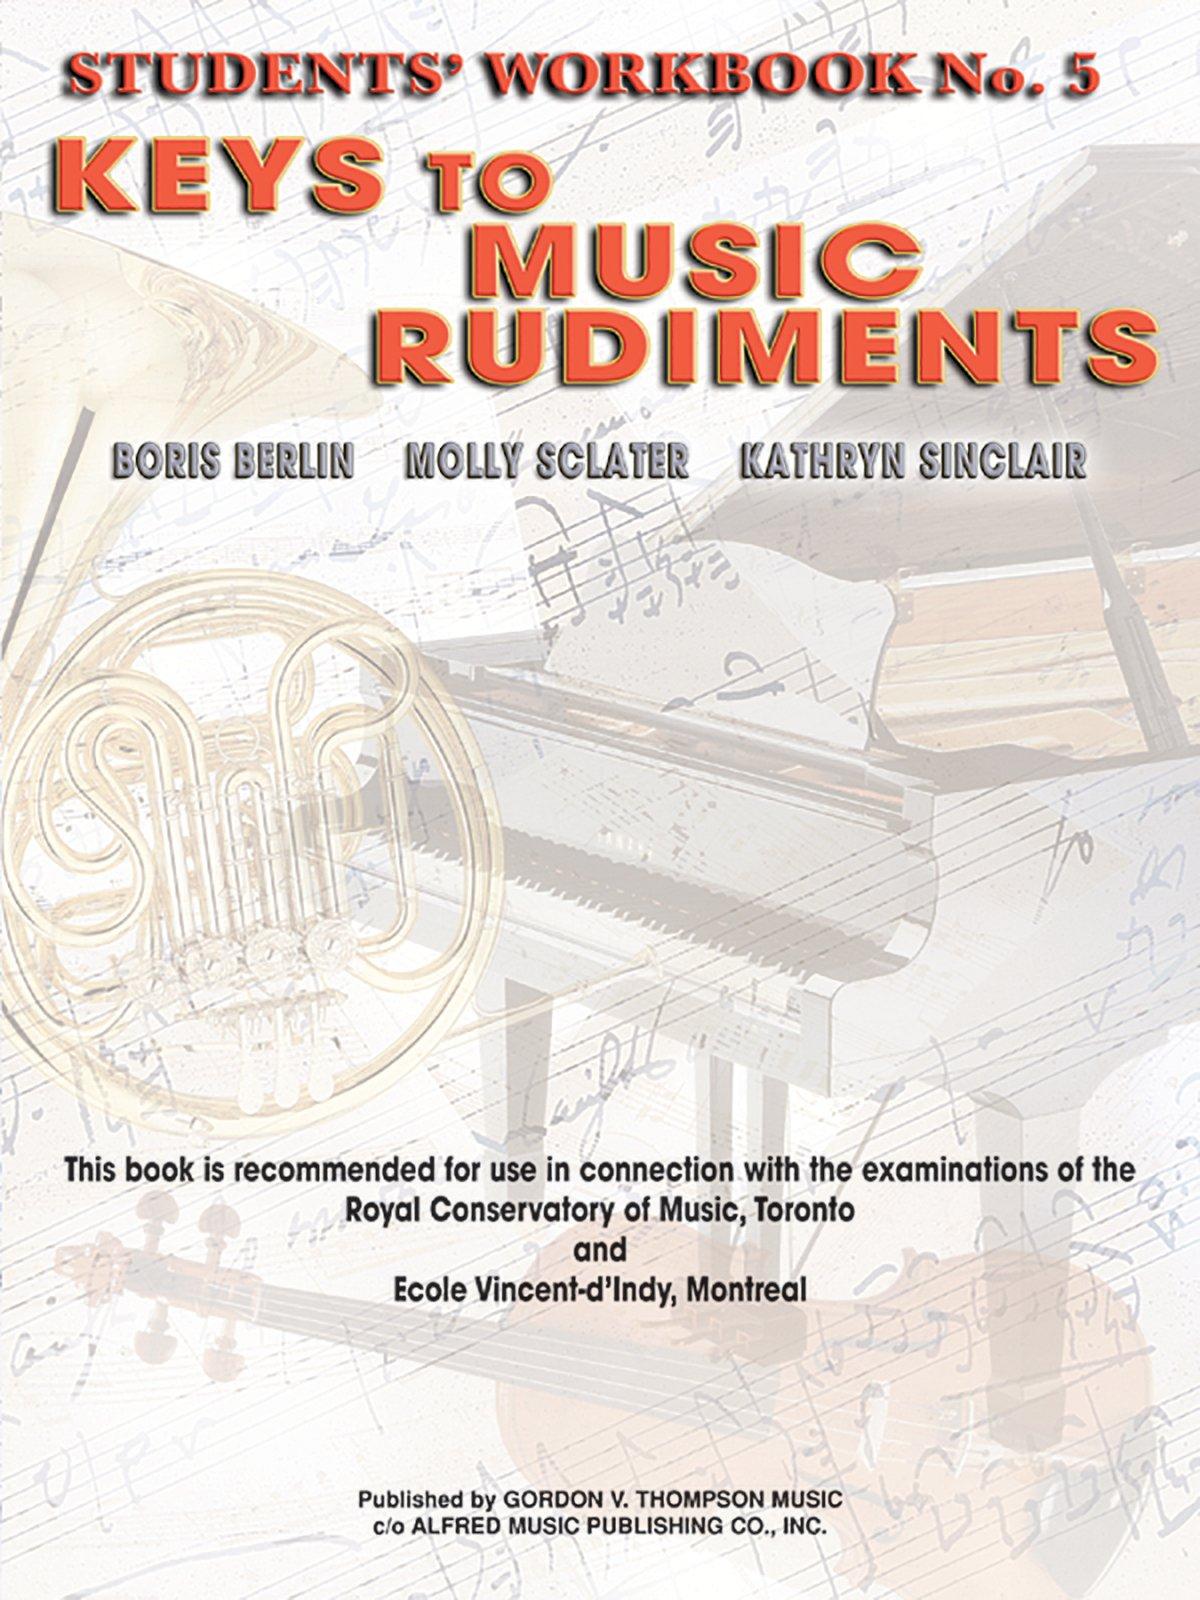 Keys to Music Rudiments: Students' Workbook No. 5 pdf